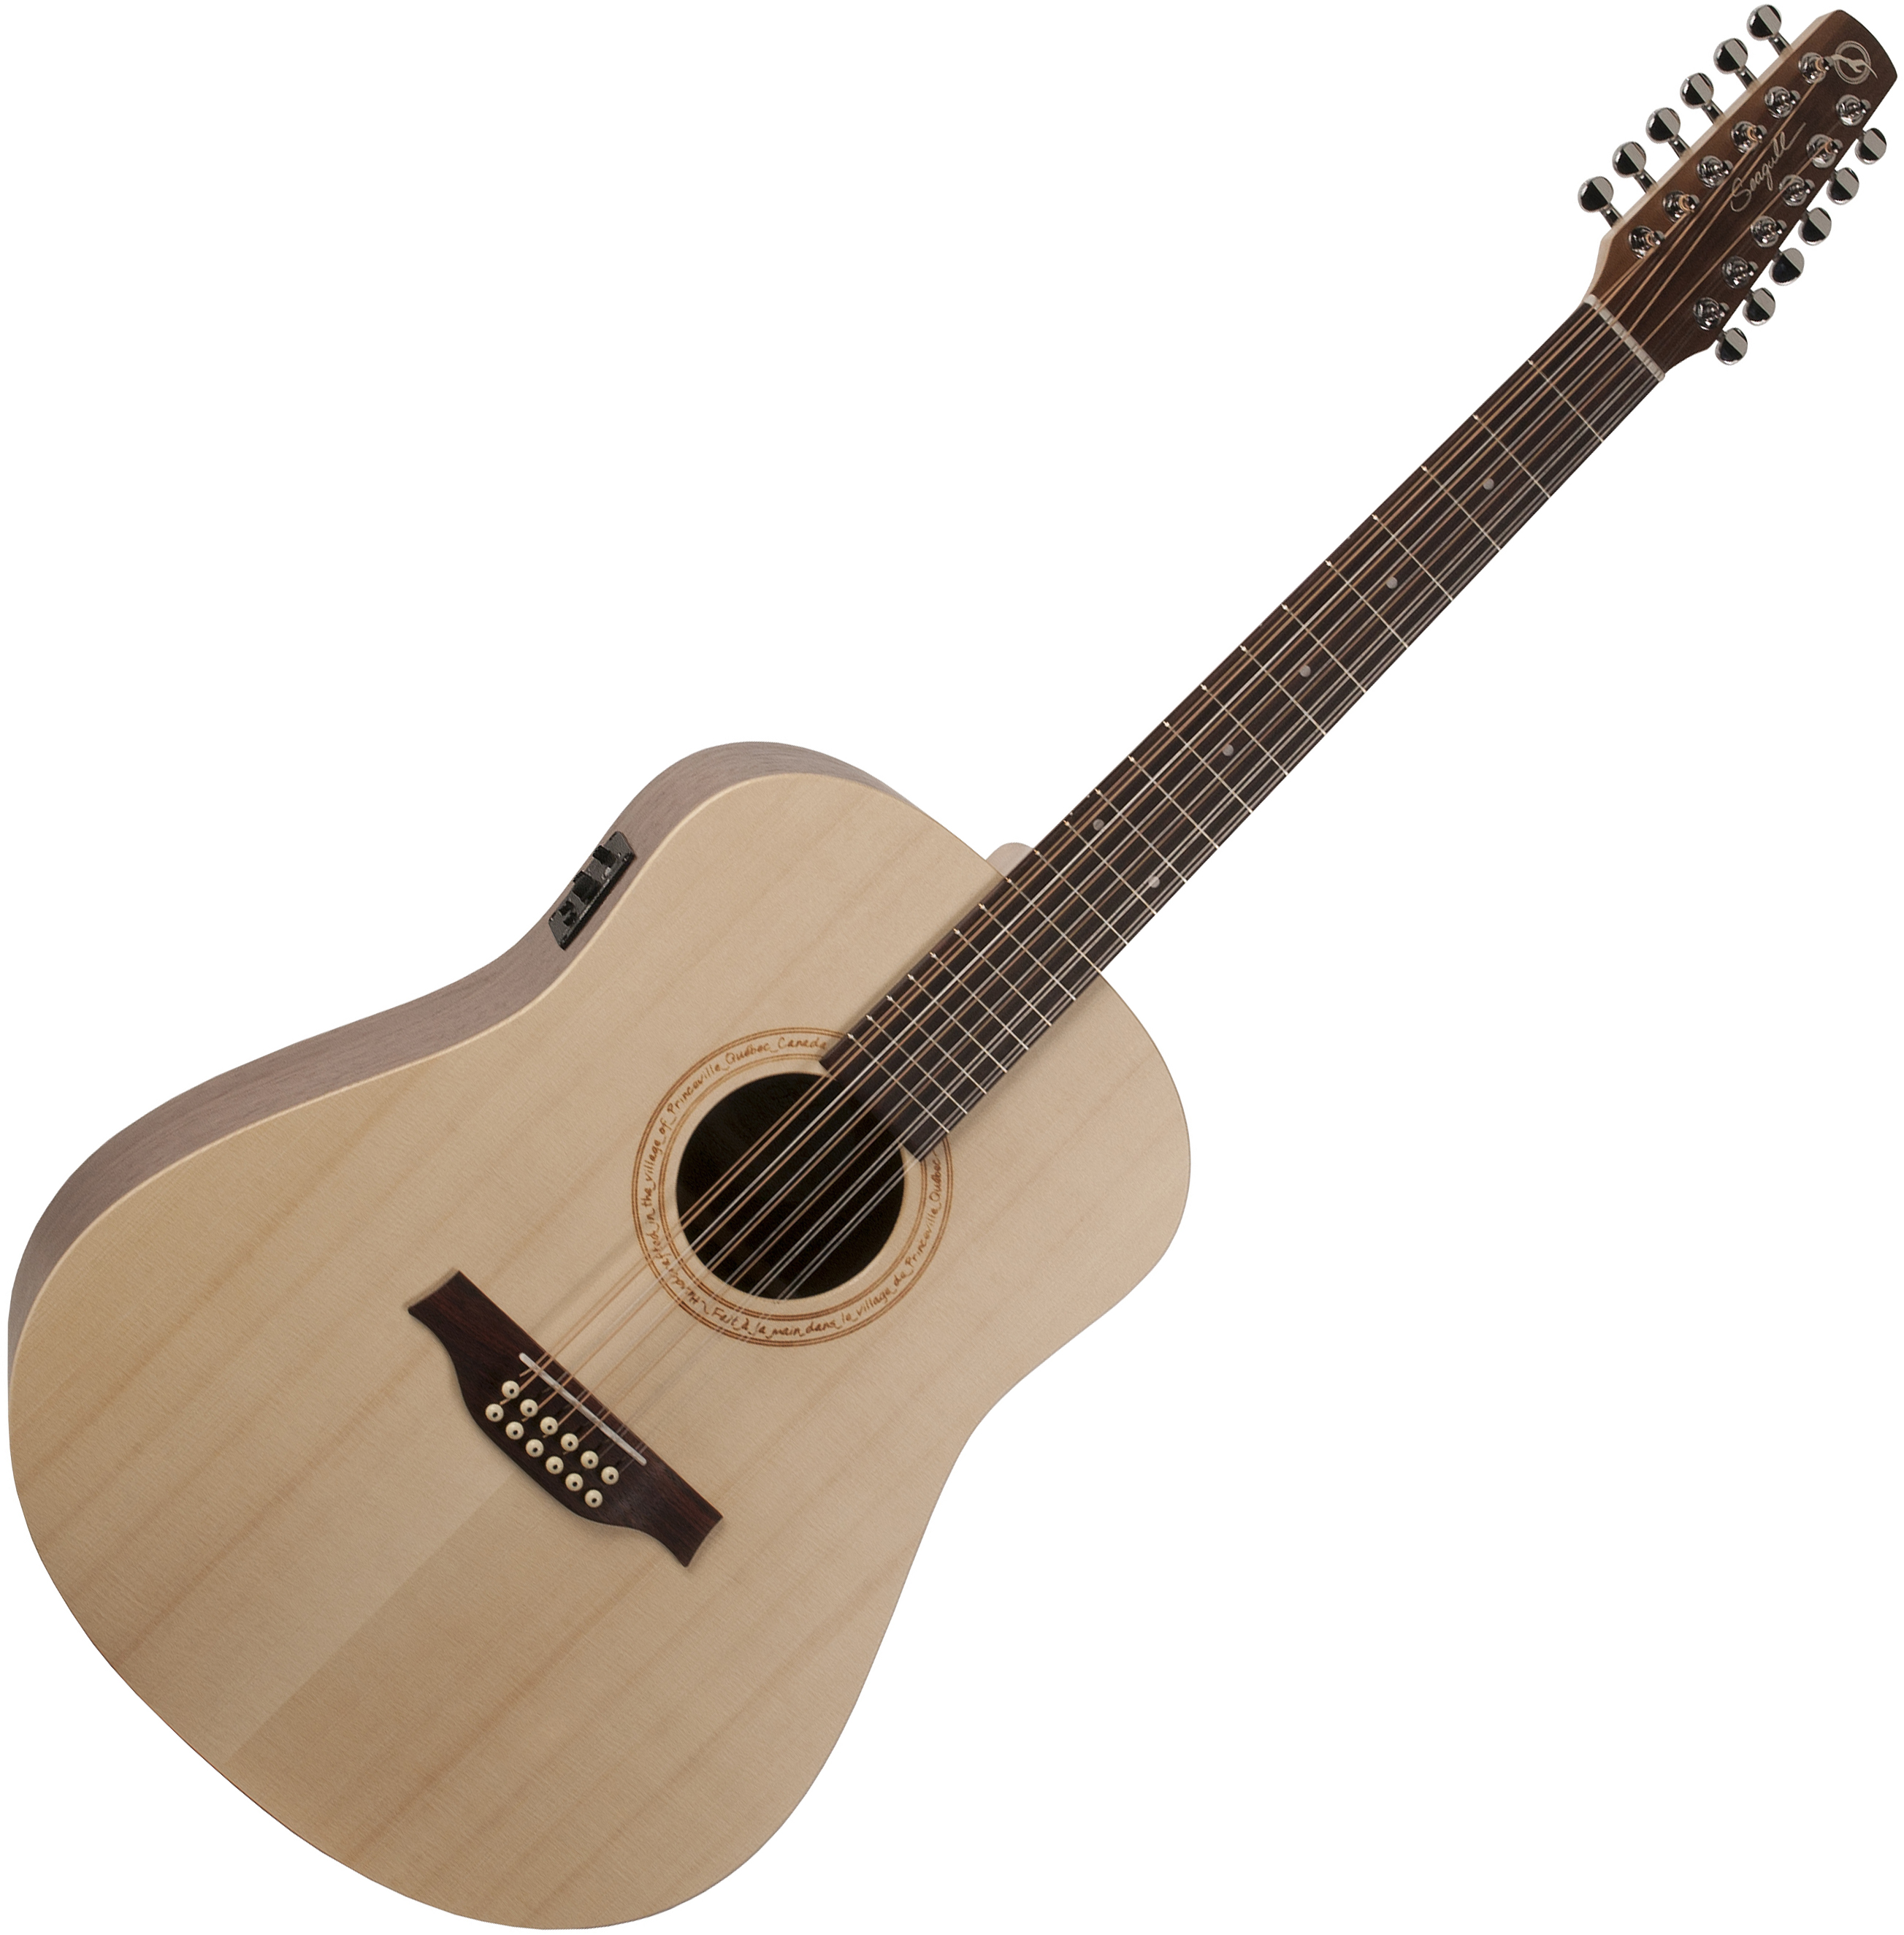 seagull excursion walnut 12 string a e guitar natural. Black Bedroom Furniture Sets. Home Design Ideas